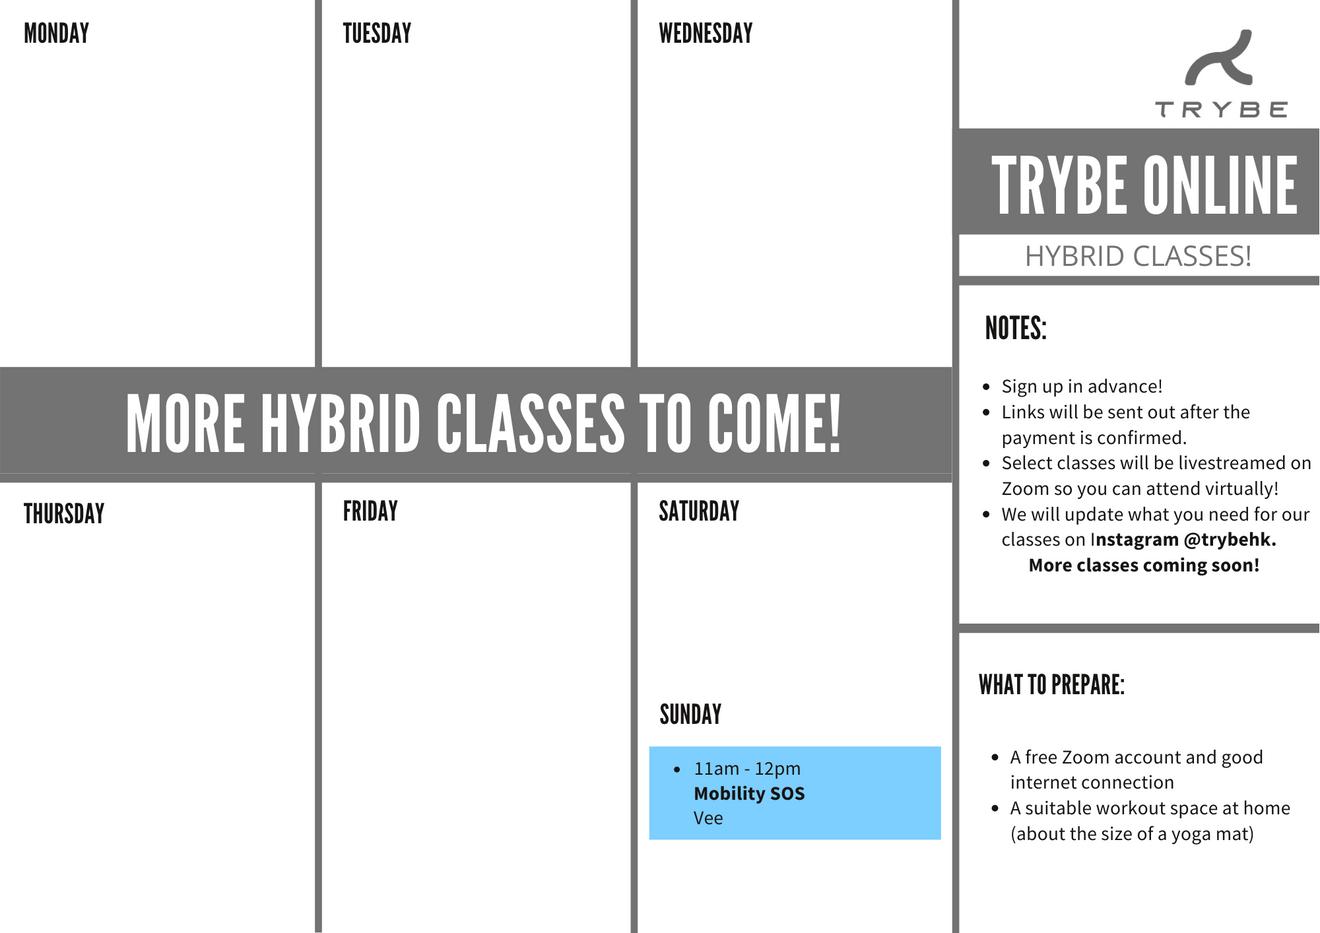 Hybrid Zoom Classes